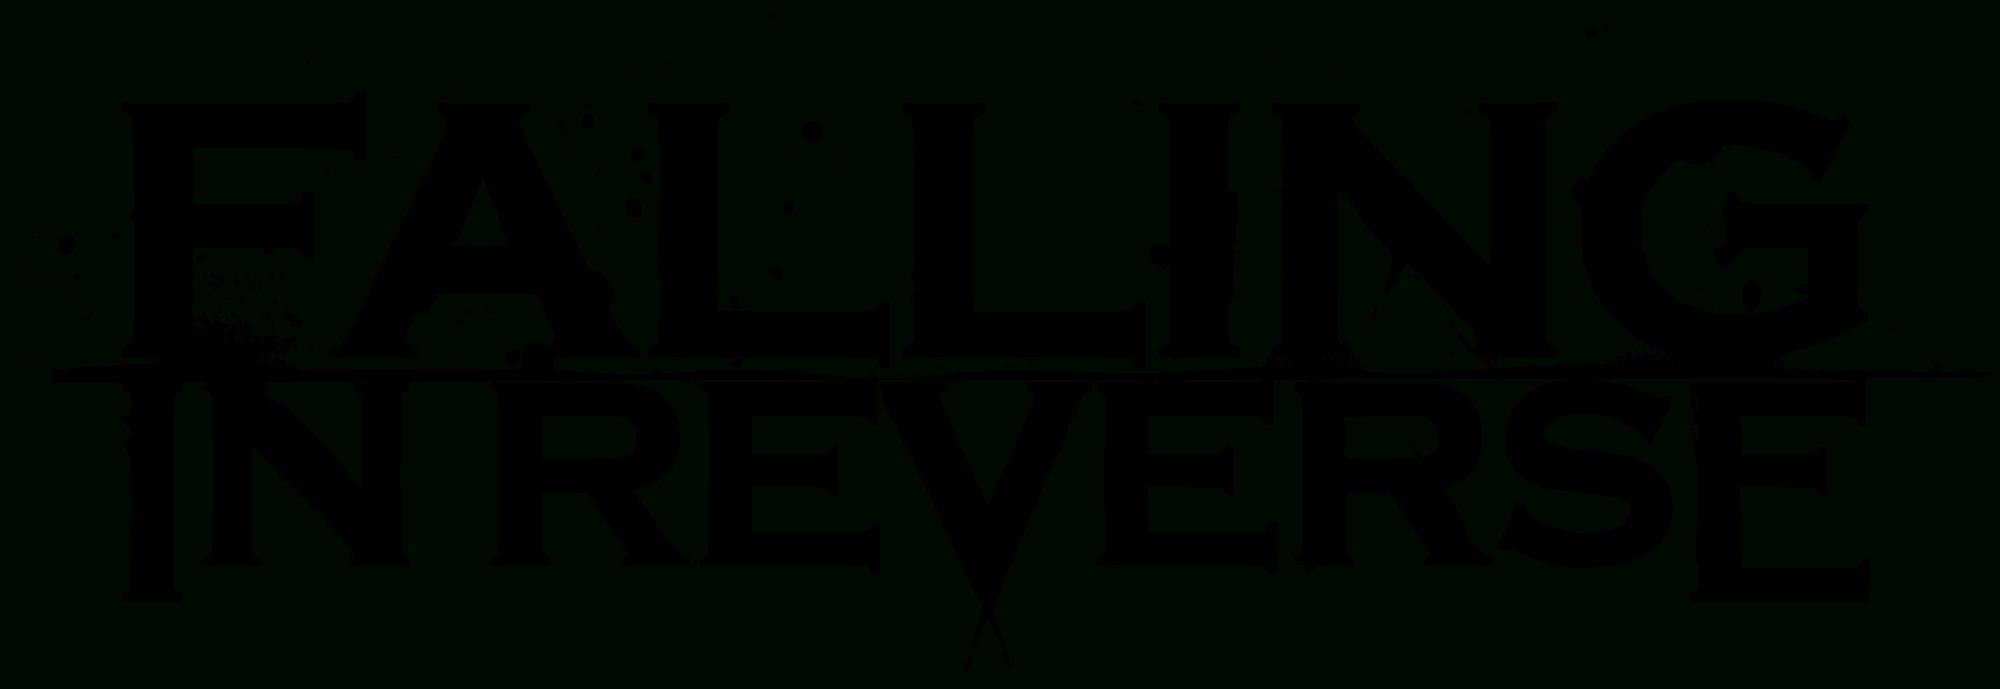 file:falling in reverse - logo.svg - wikimedia commons